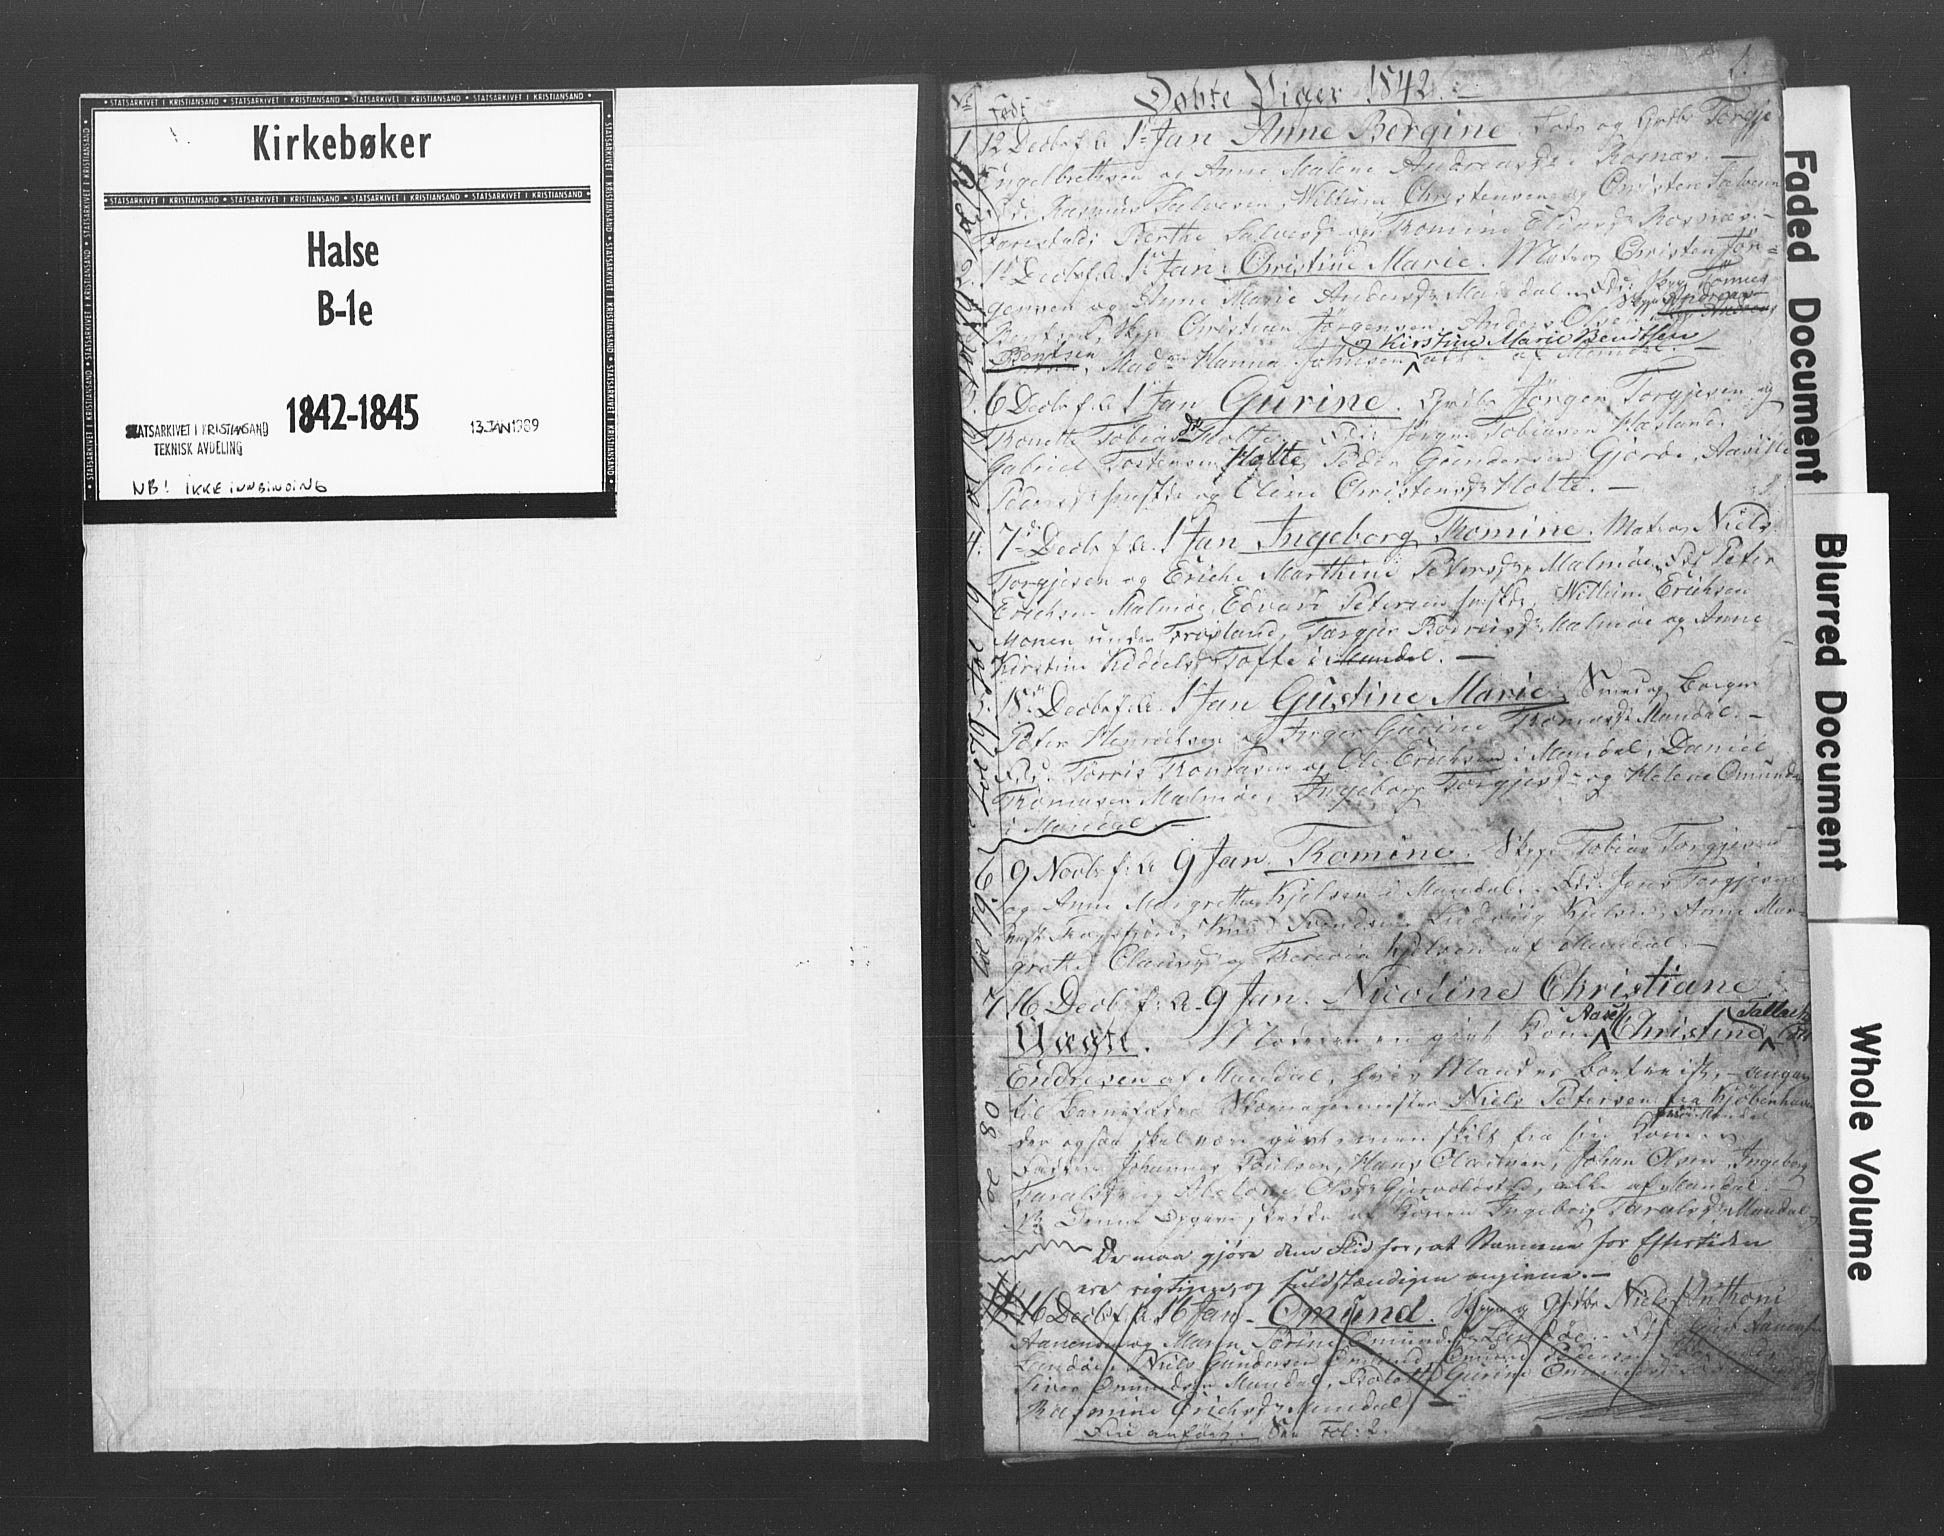 SAK, Mandal sokneprestkontor, F/Fb/Fba/L0005: Klokkerbok nr. B 1E, 1842-1845, s. 1